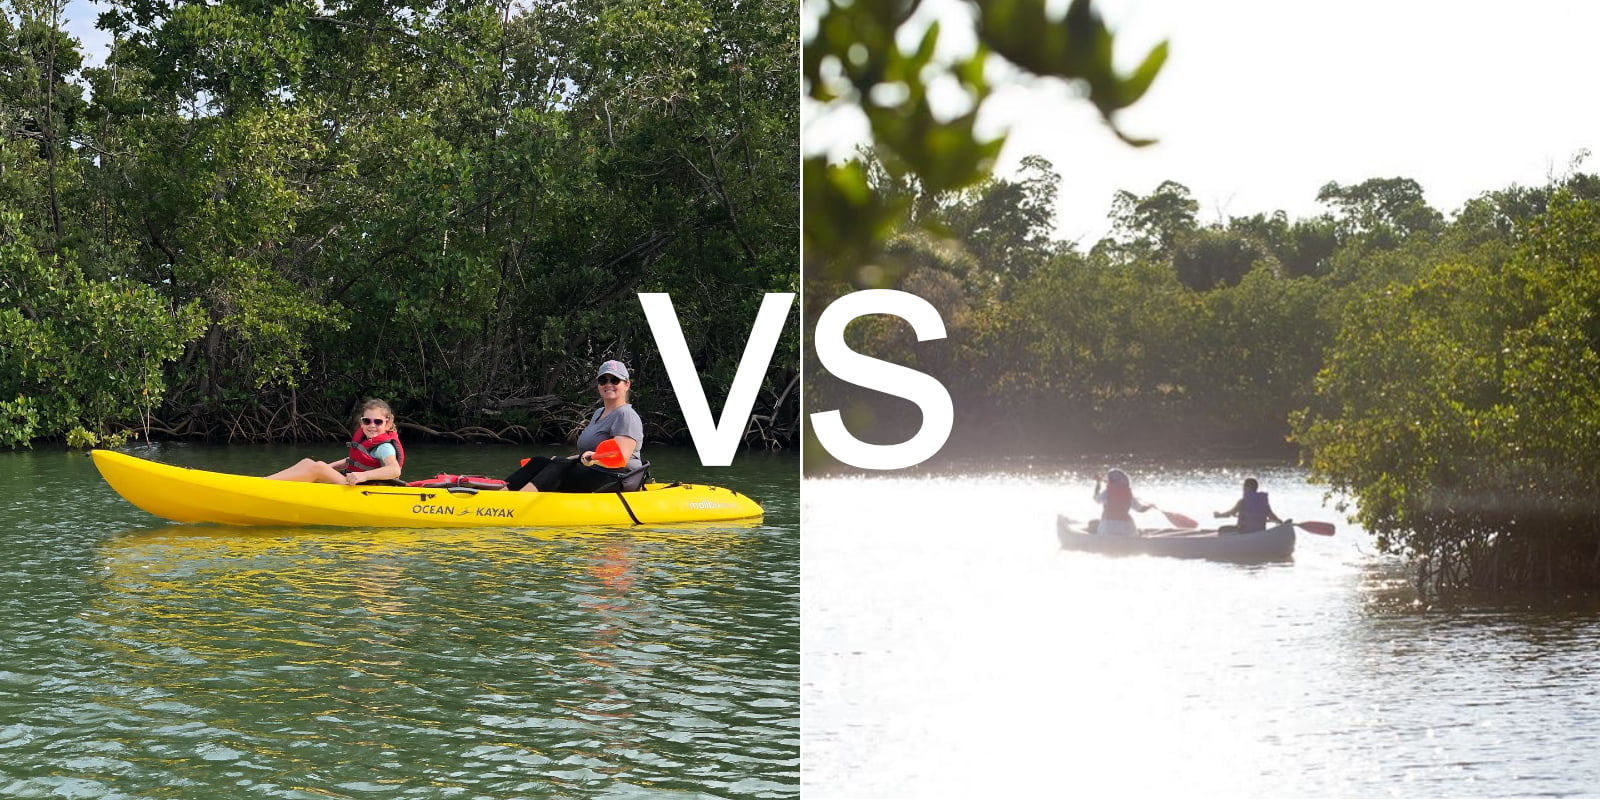 Kayaking vs Canoeing at Lovers Key State Park